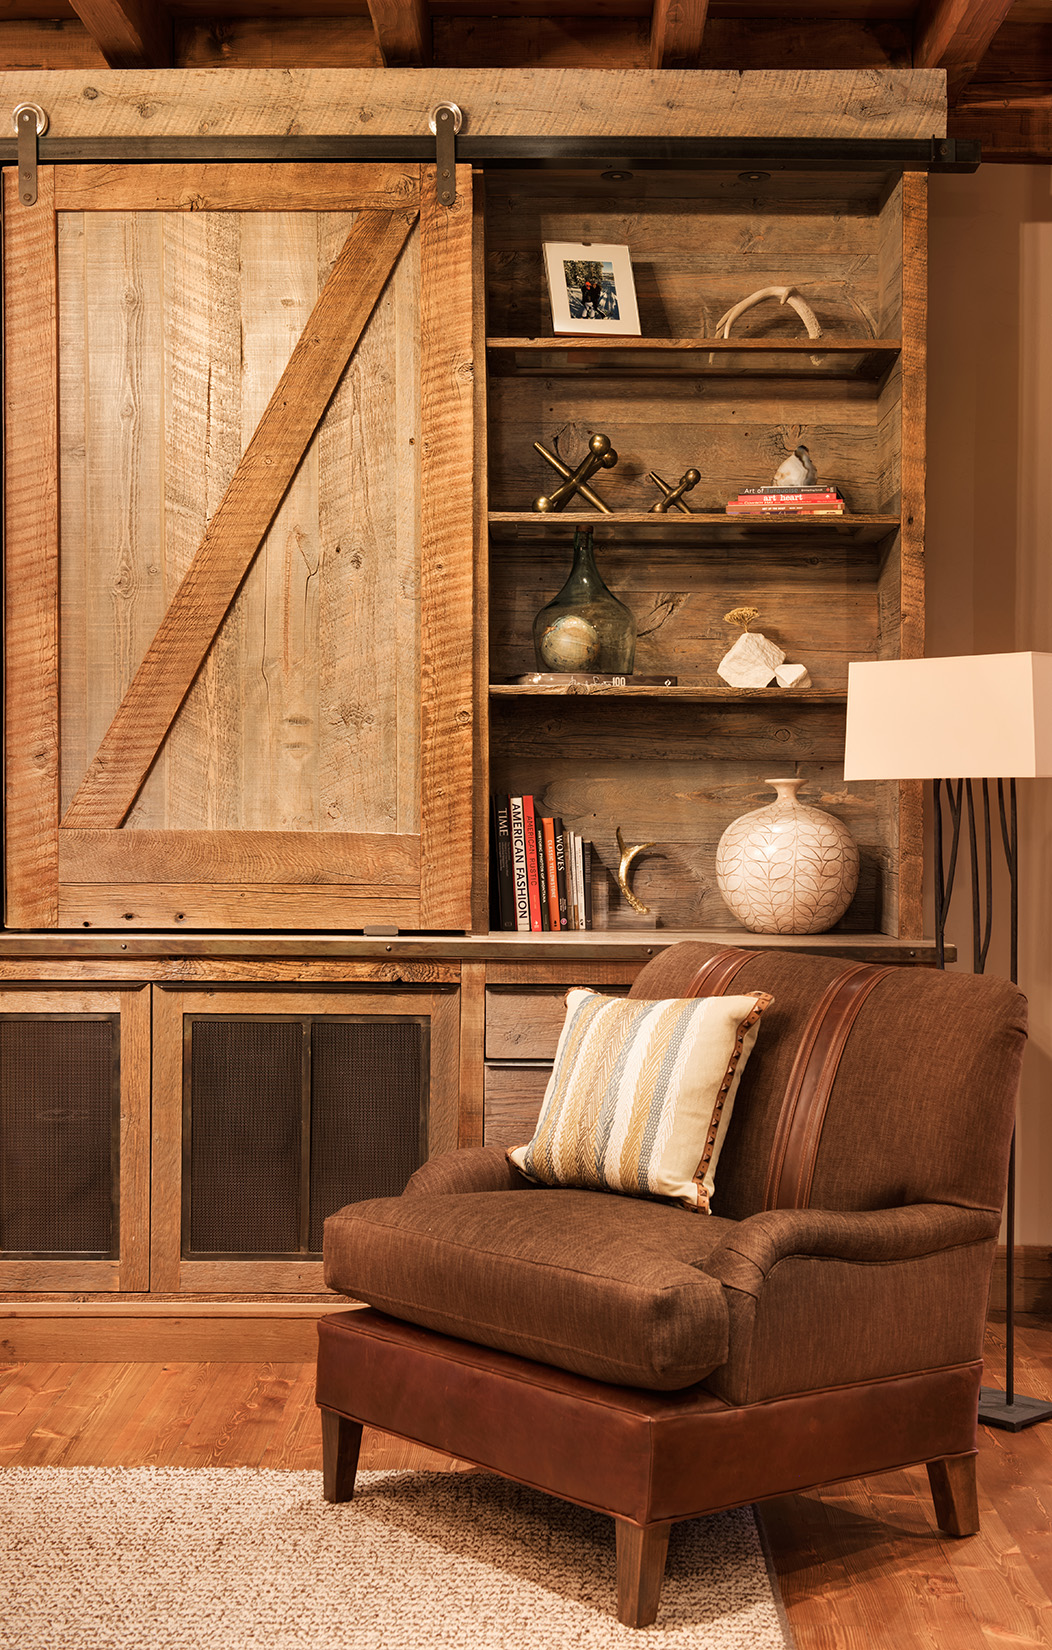 The sliding barn door and reclaimed wood shelves are fantastic! Interior Design -  Varda Interiors